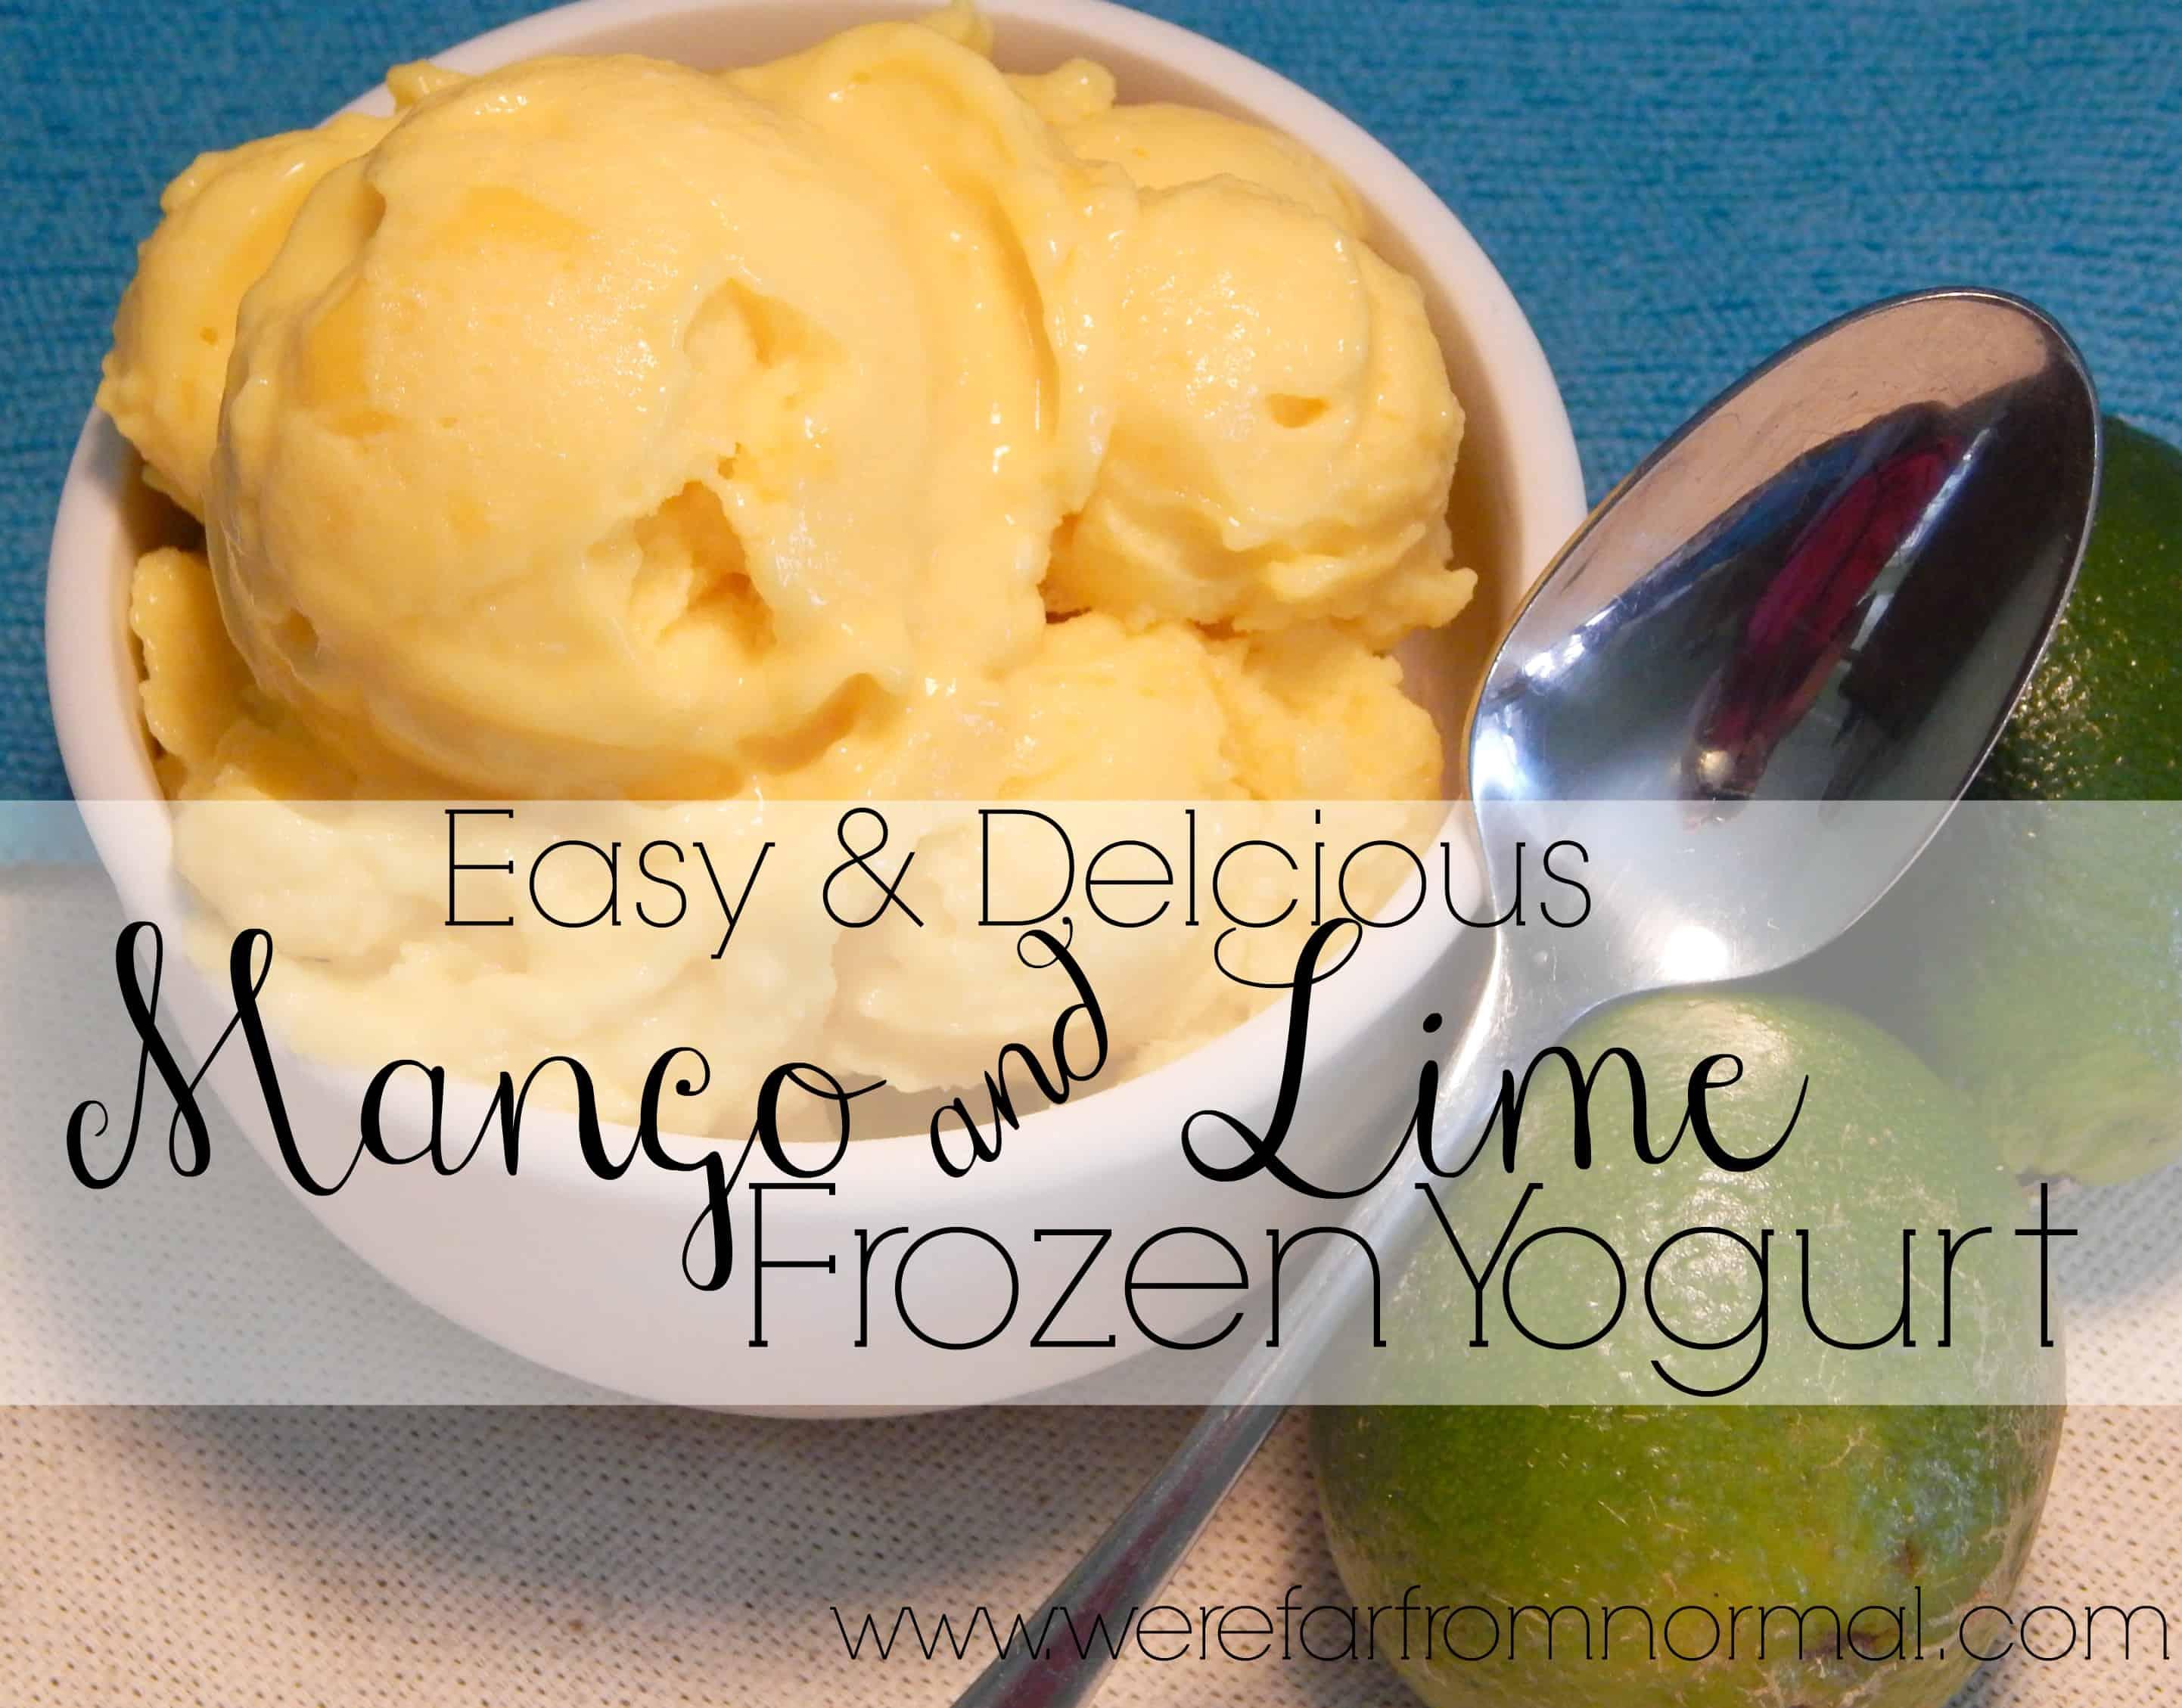 Easy & Delicious Mango Lime Frozen Yogurt